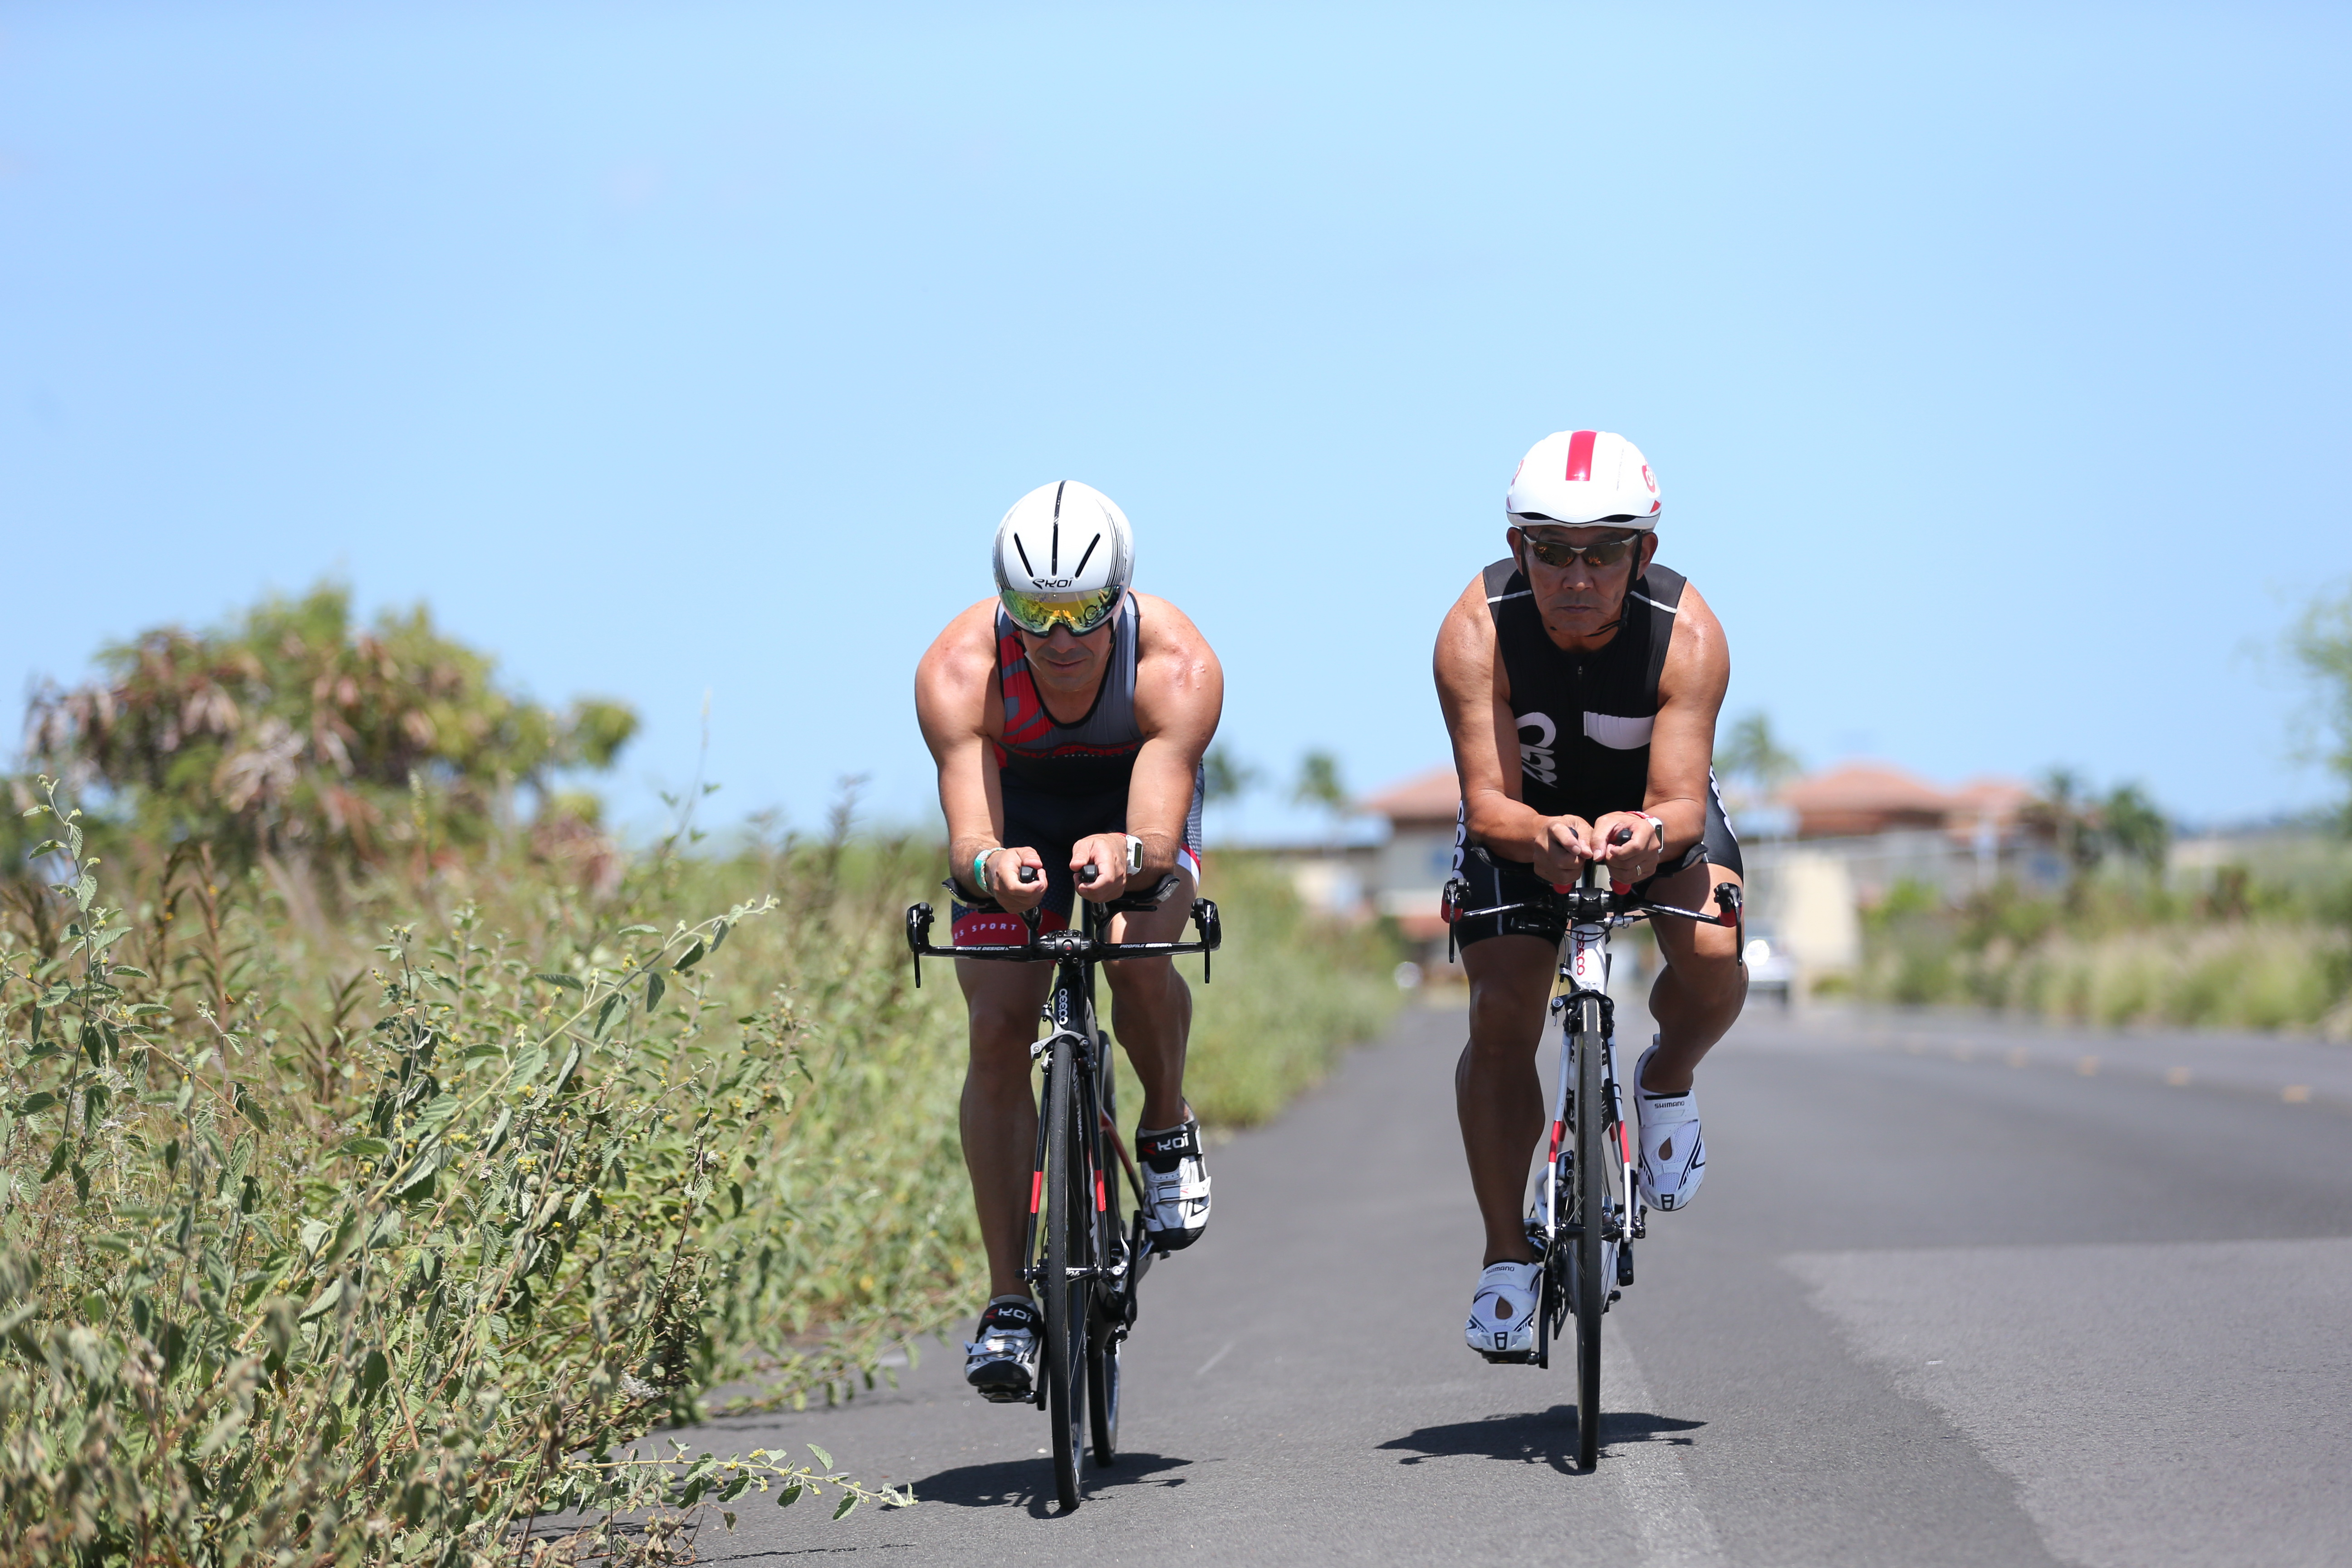 Présentation vélo de triathlon CEEPO 2016: KATANA et VIPER